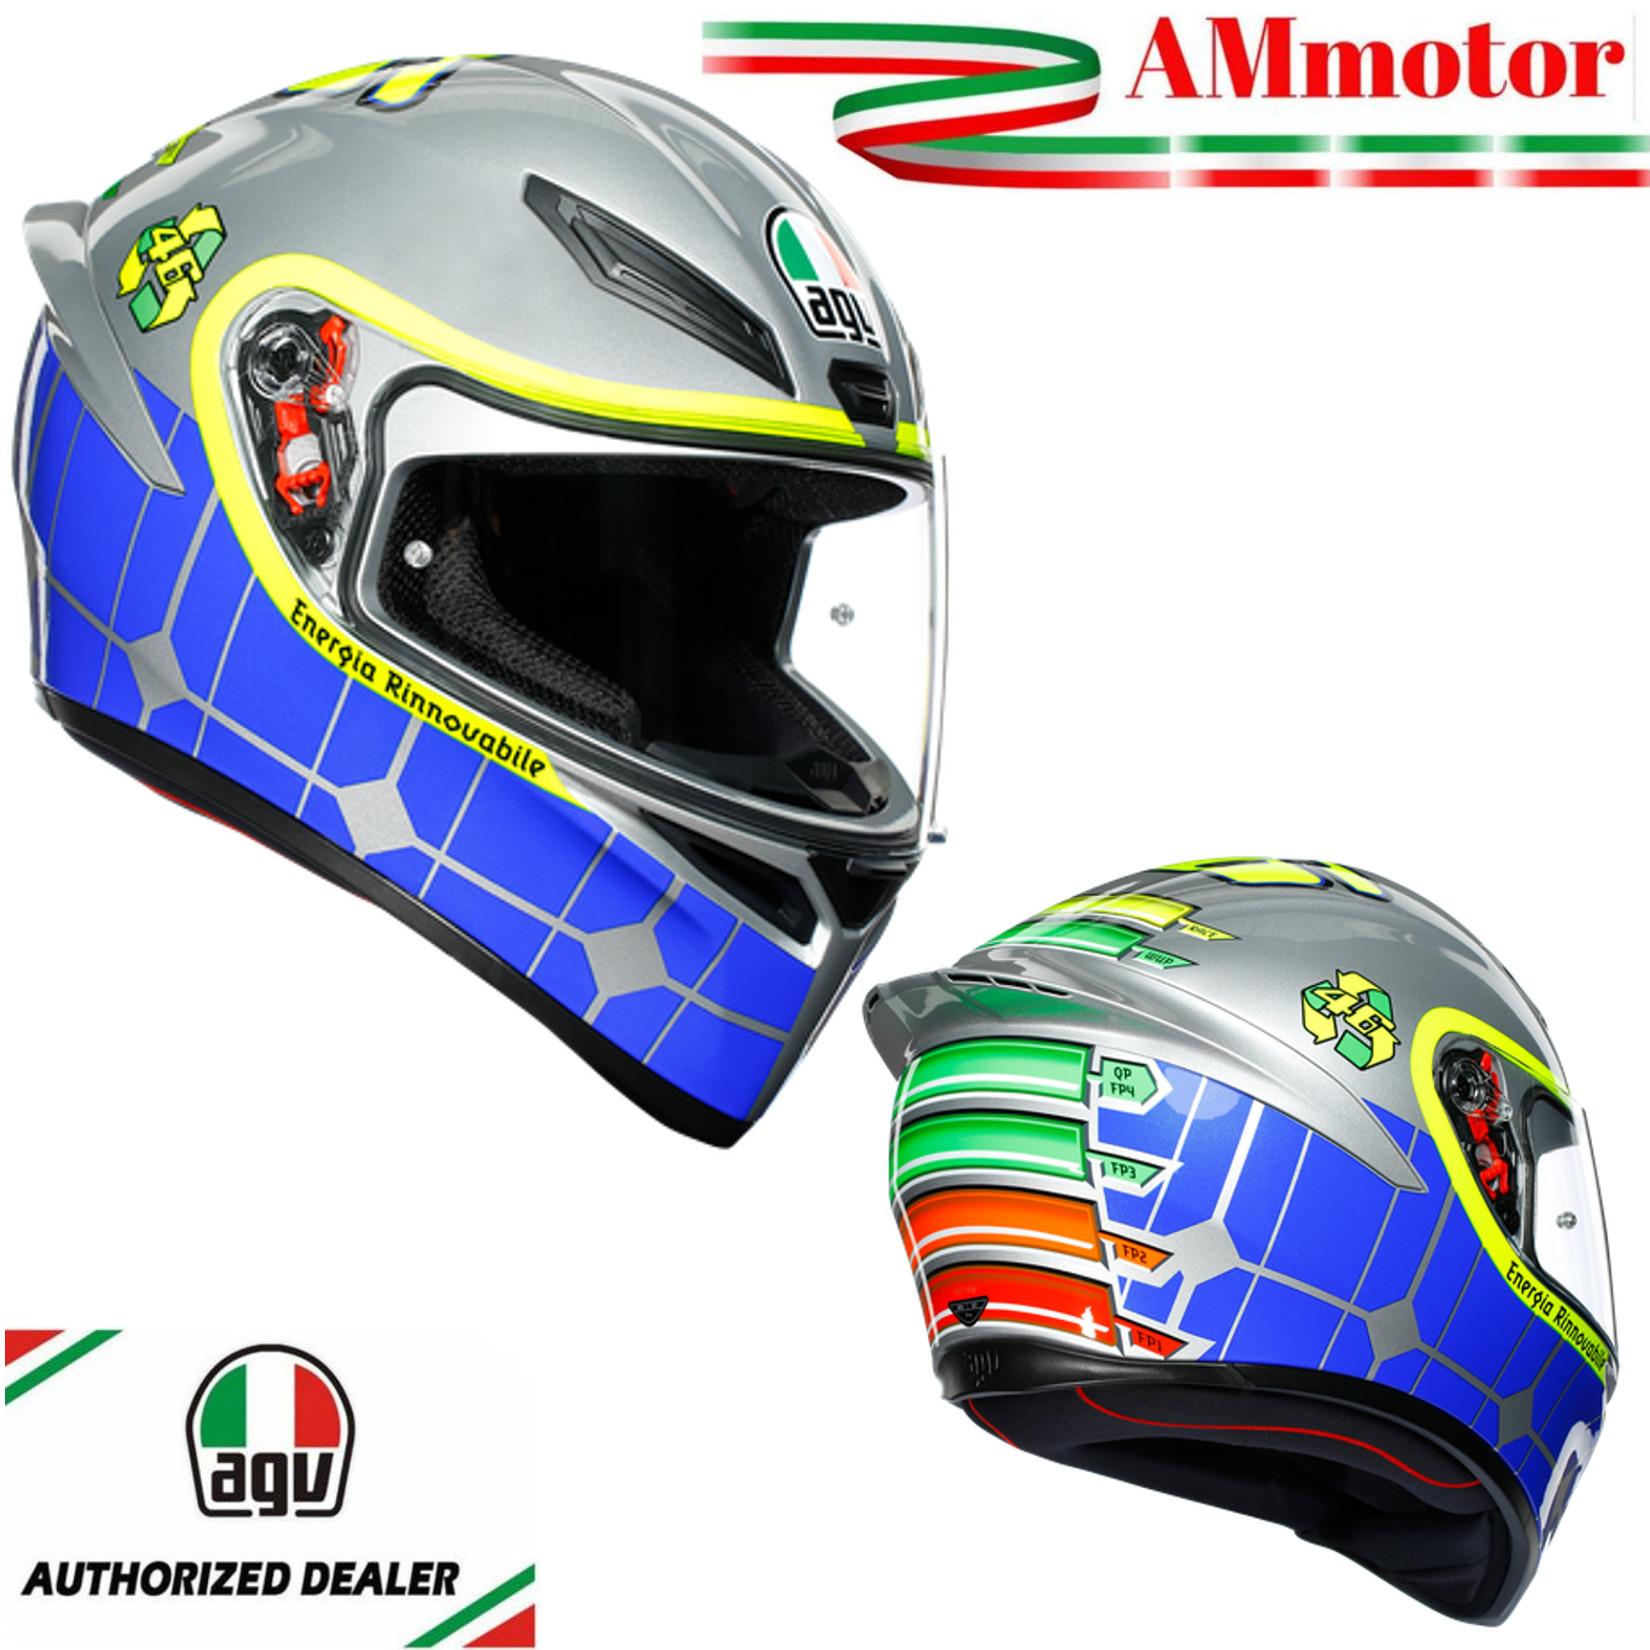 Helmet Valentino Rossi Agv K1 Mugello 2015 Full Face Size S 55 Motorcycle Road Ebay